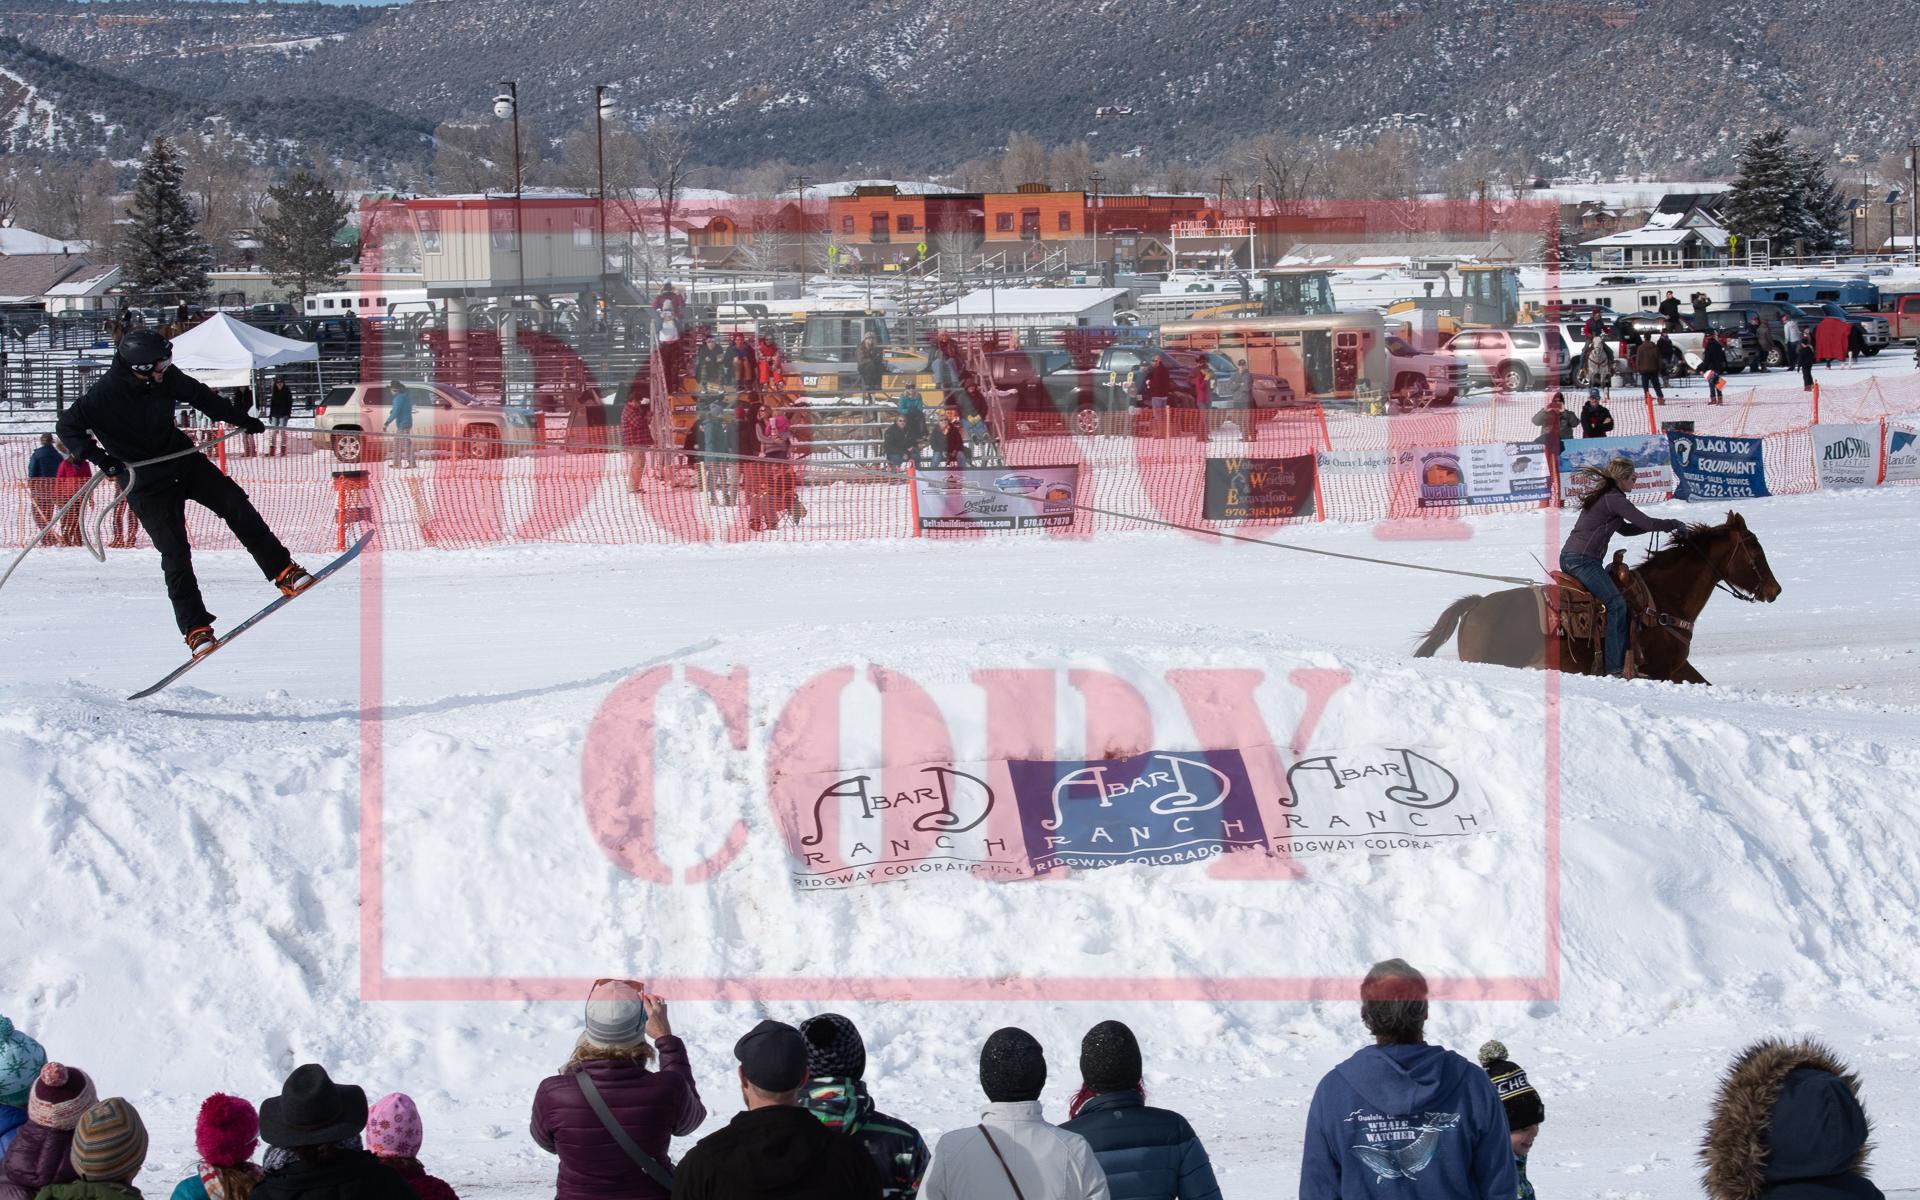 - Amanda Sanders - Snowboard 7